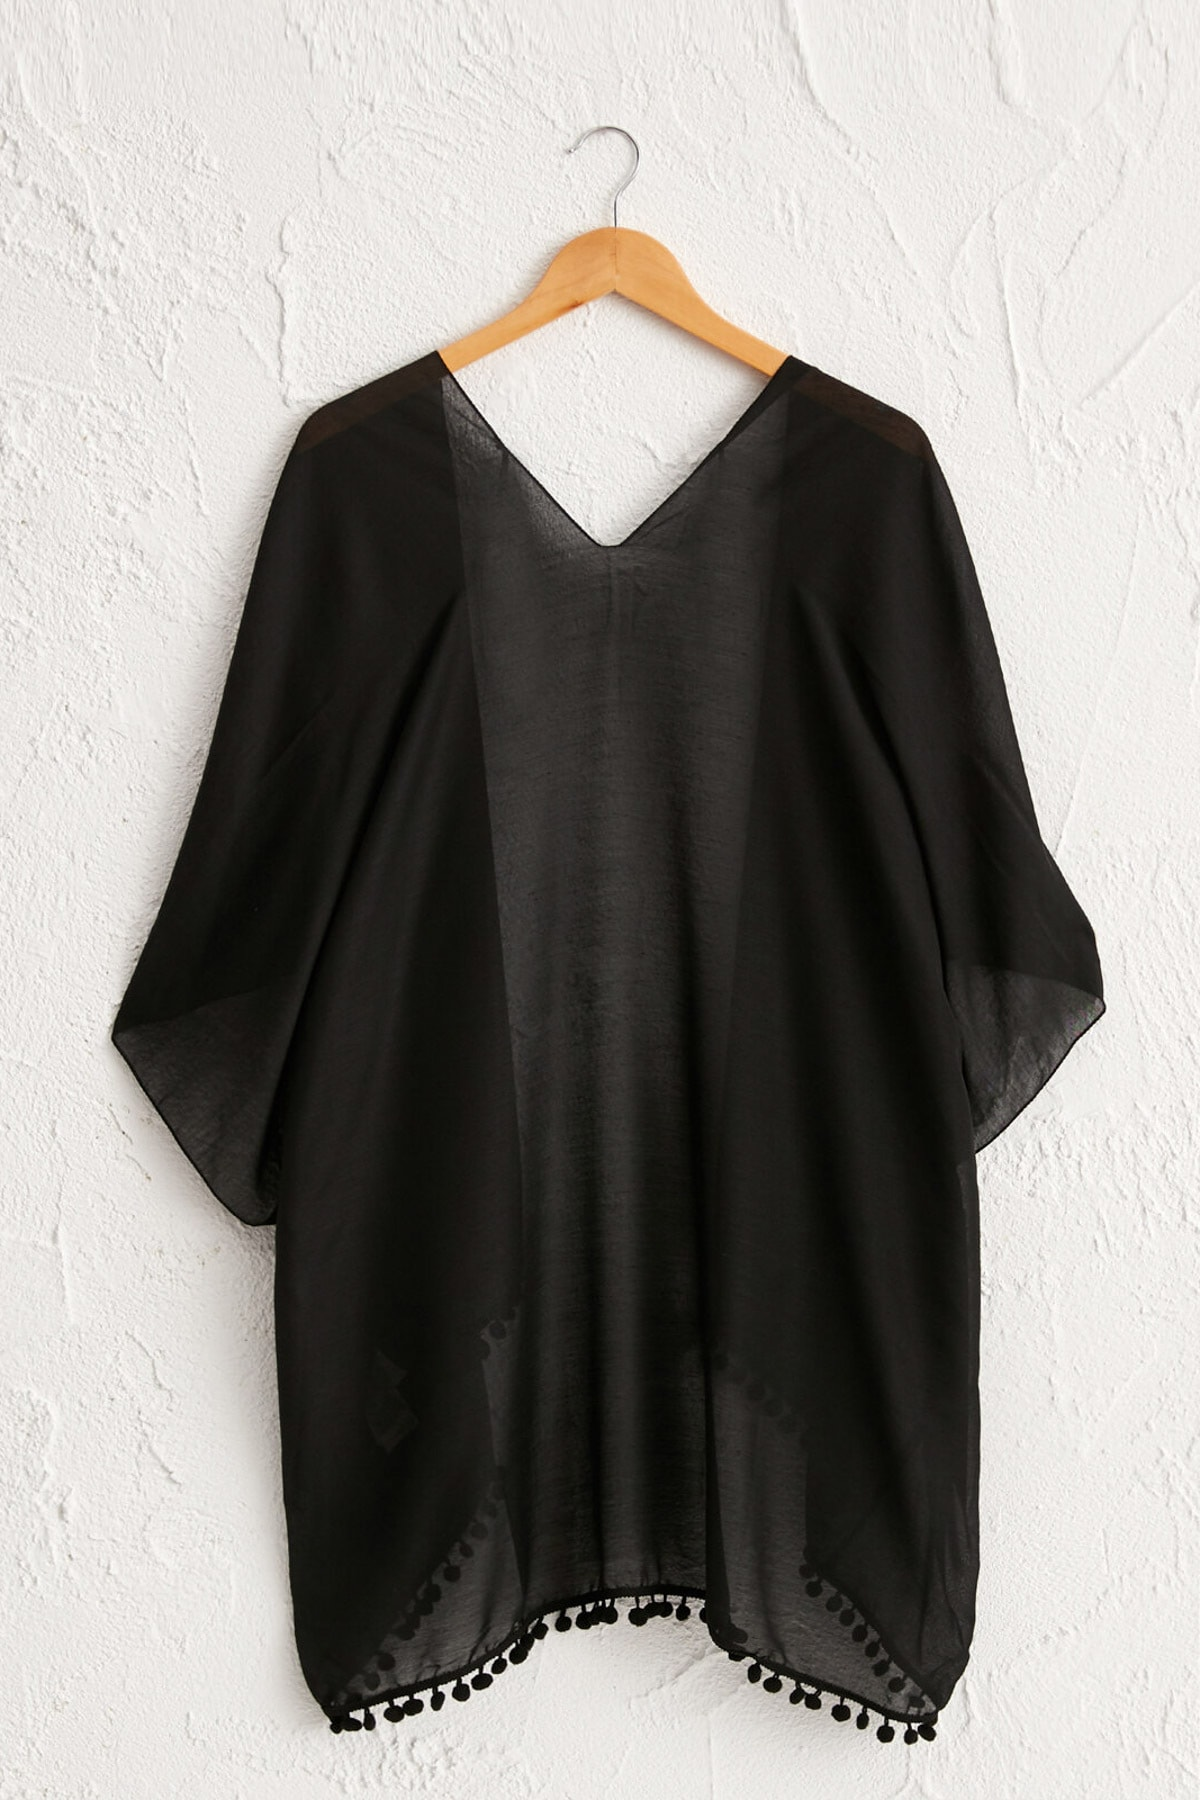 LC Waikiki Kadın Yeni Siyah Elbise 0SE625Z8 2